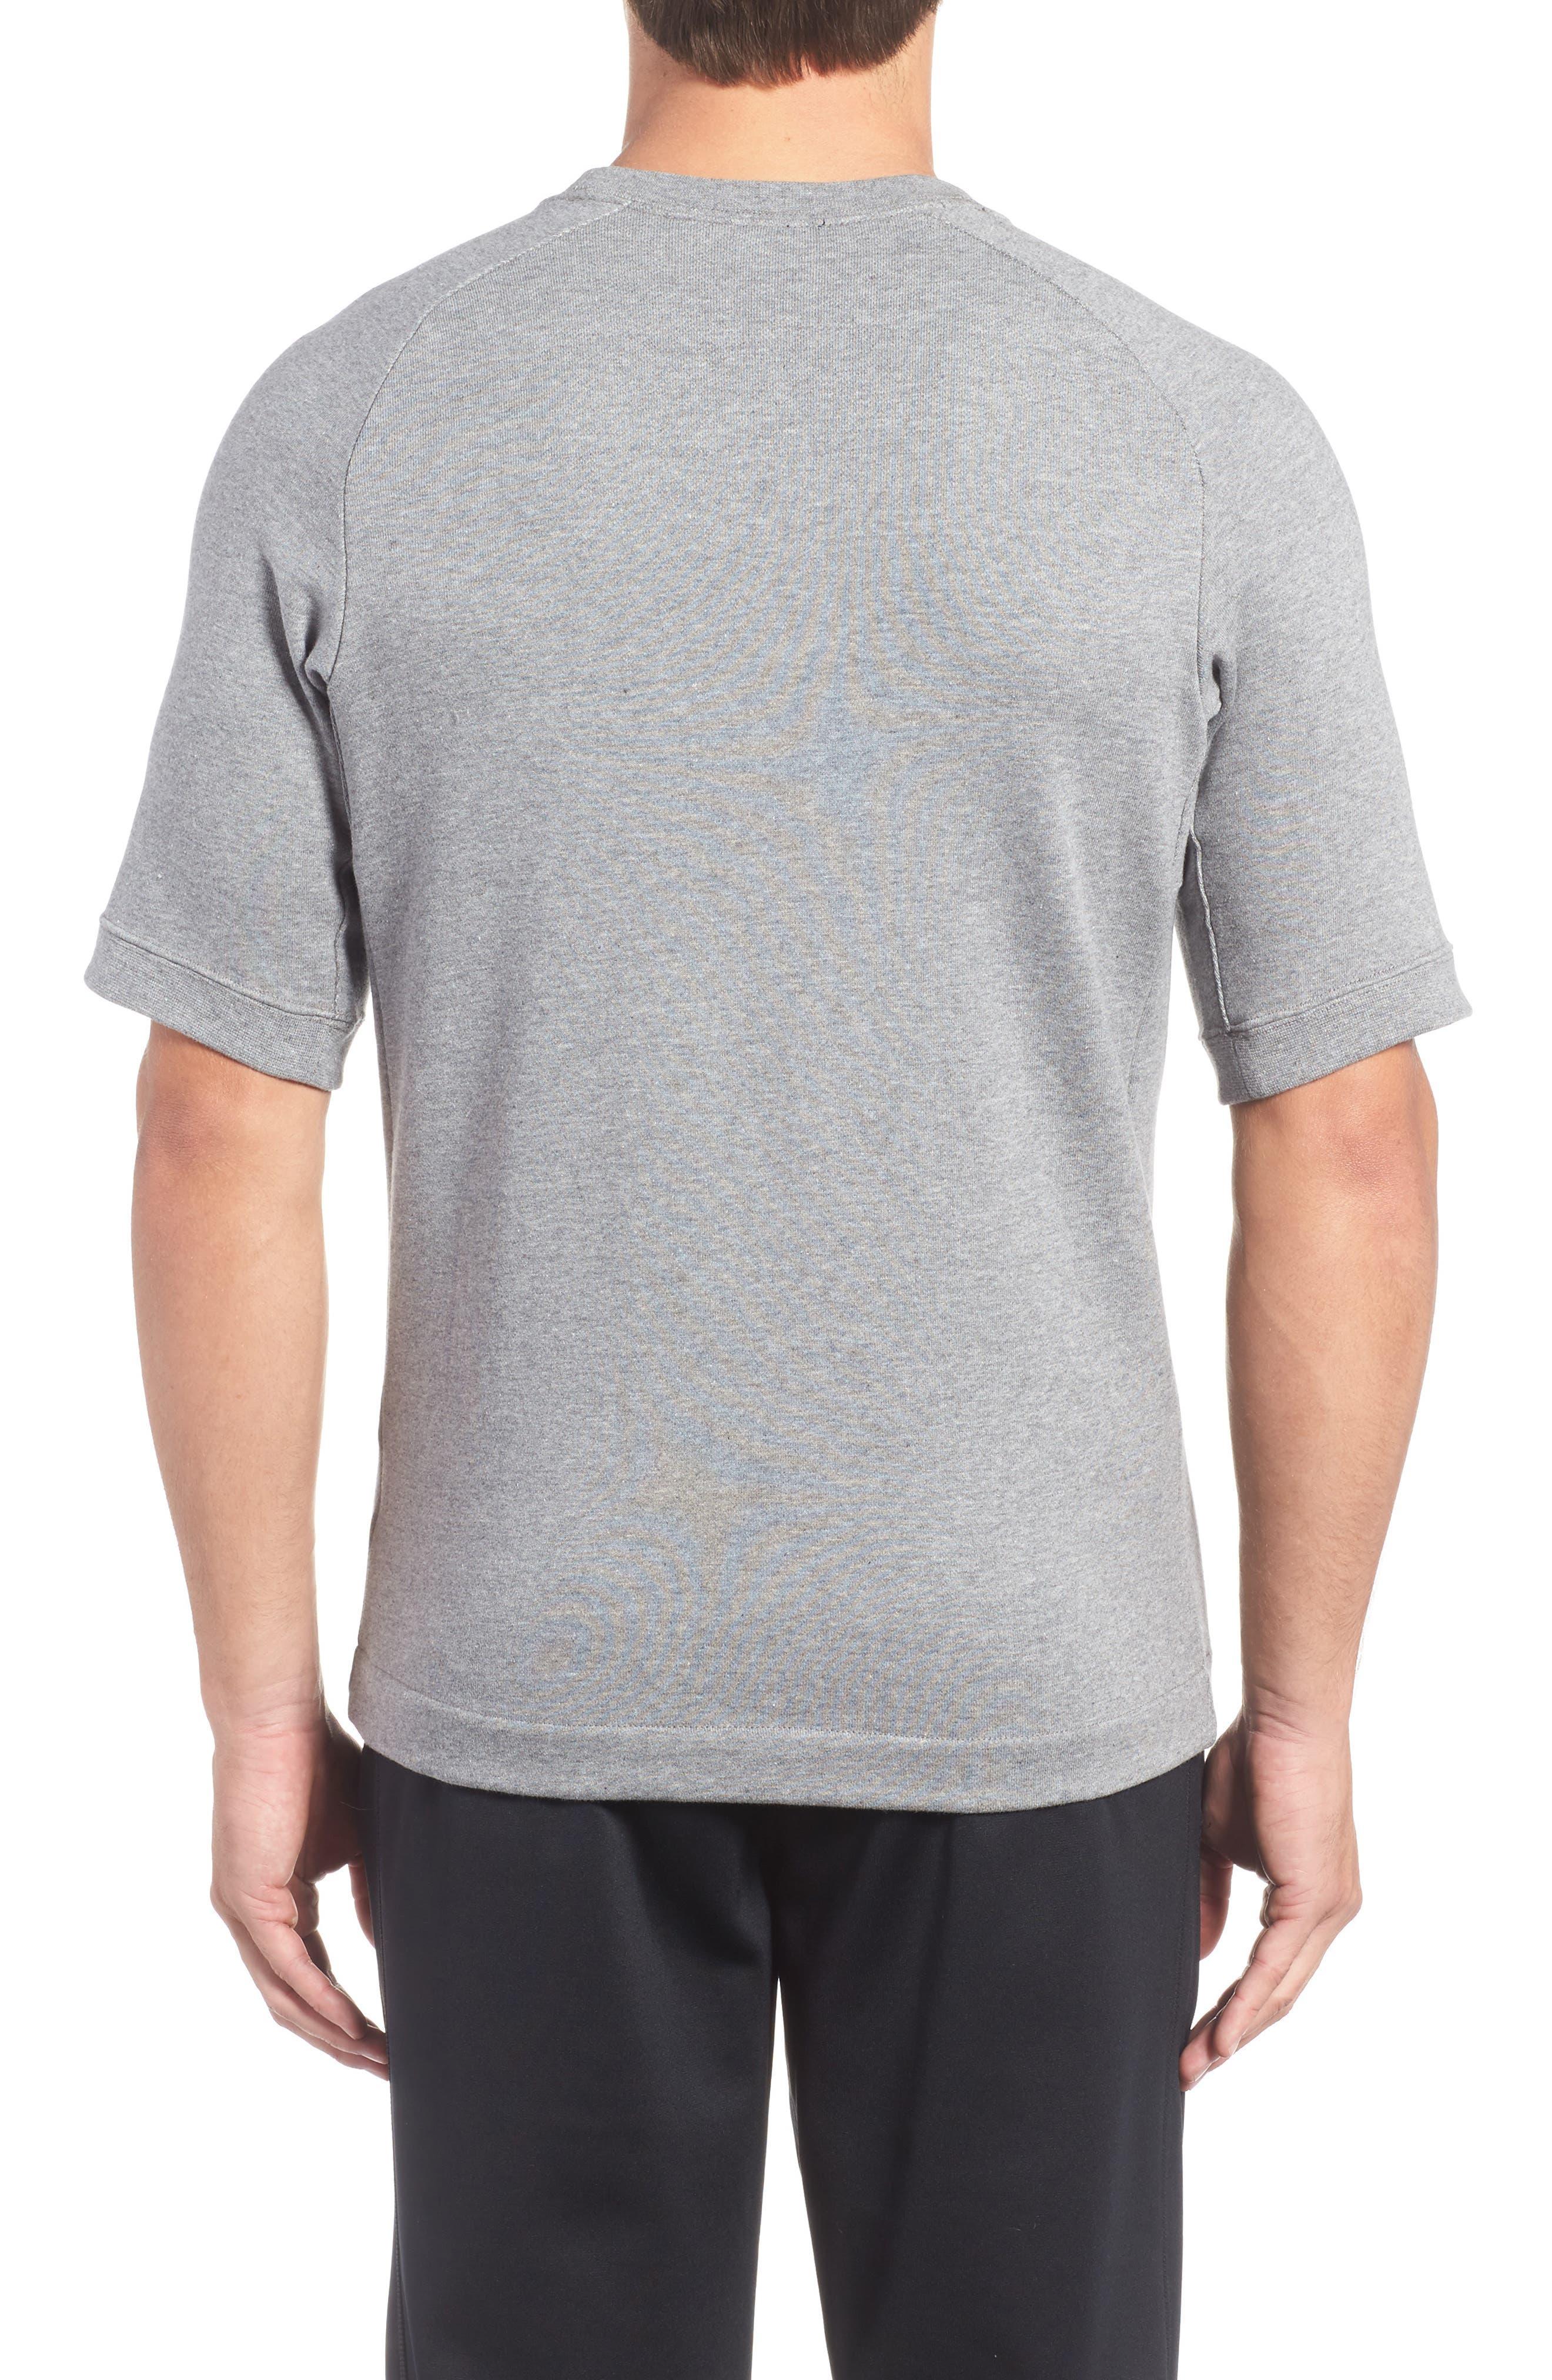 Sportswear Modern Crew T-Shirt,                             Alternate thumbnail 2, color,                             Grey